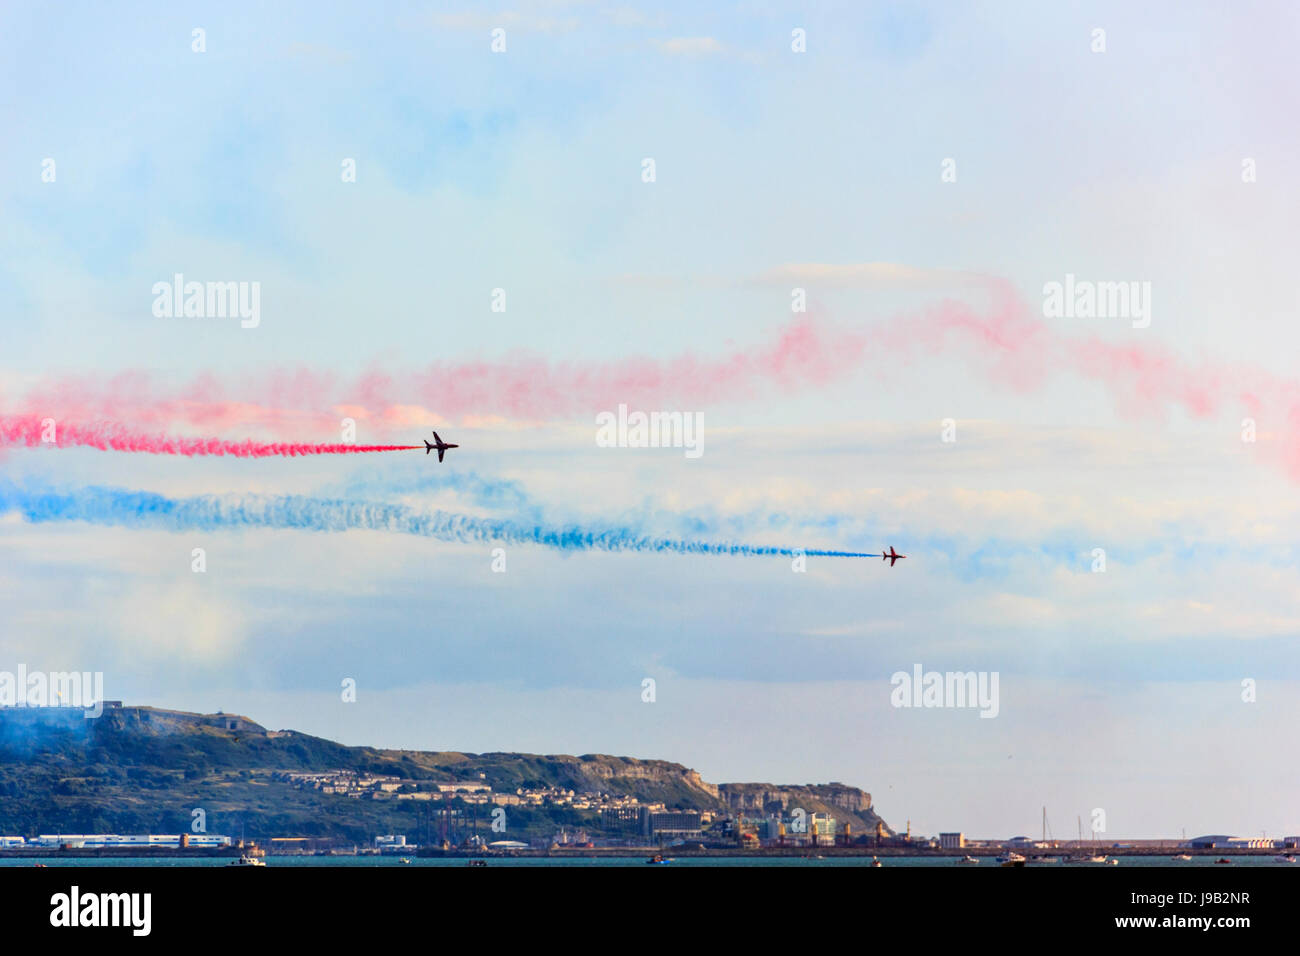 Kunstflug Display durch die roten Pfeile Royal Air Force Kunstflugstaffel in Weymouth, England, August 2014 Stockfoto